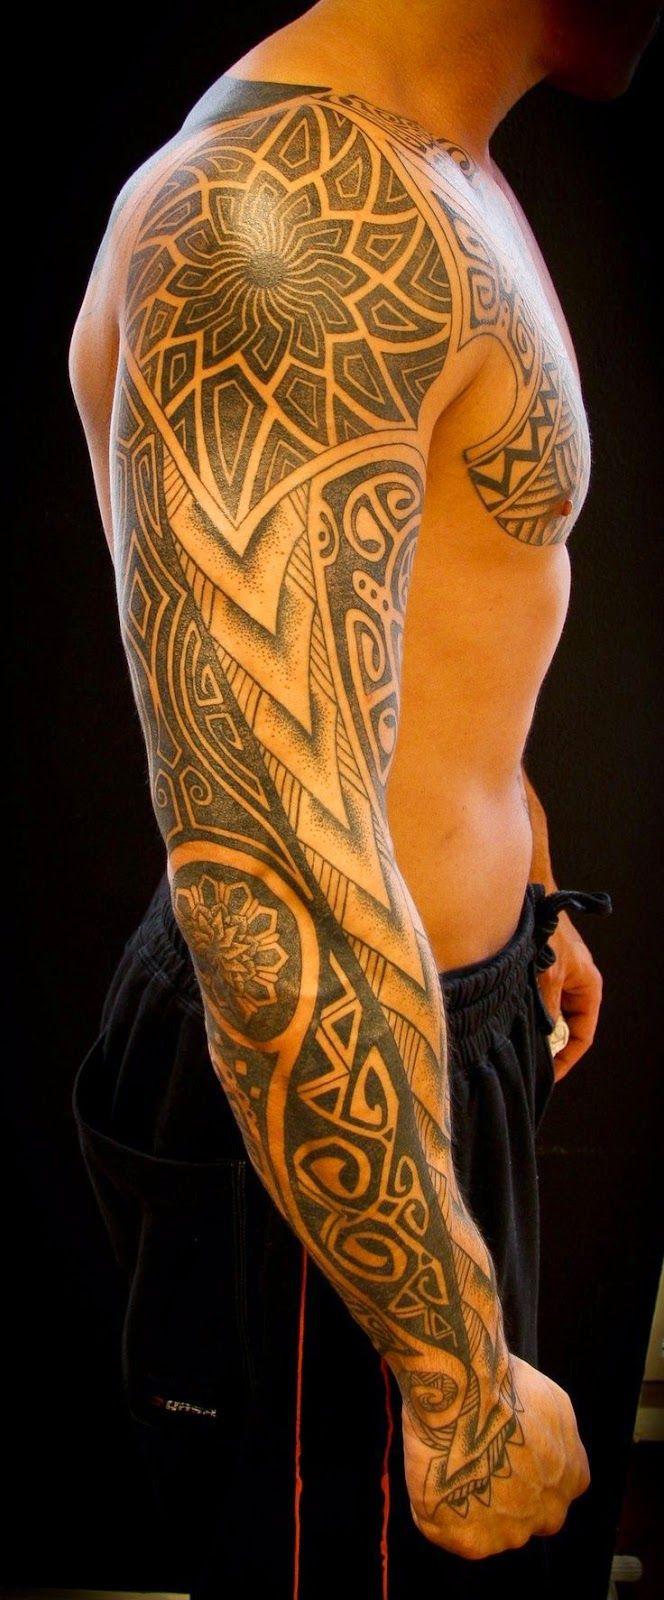 Tattoo ideas for men on arm sleeve tattoos awesome sleeve tattoos  tattoo designs  pinterest